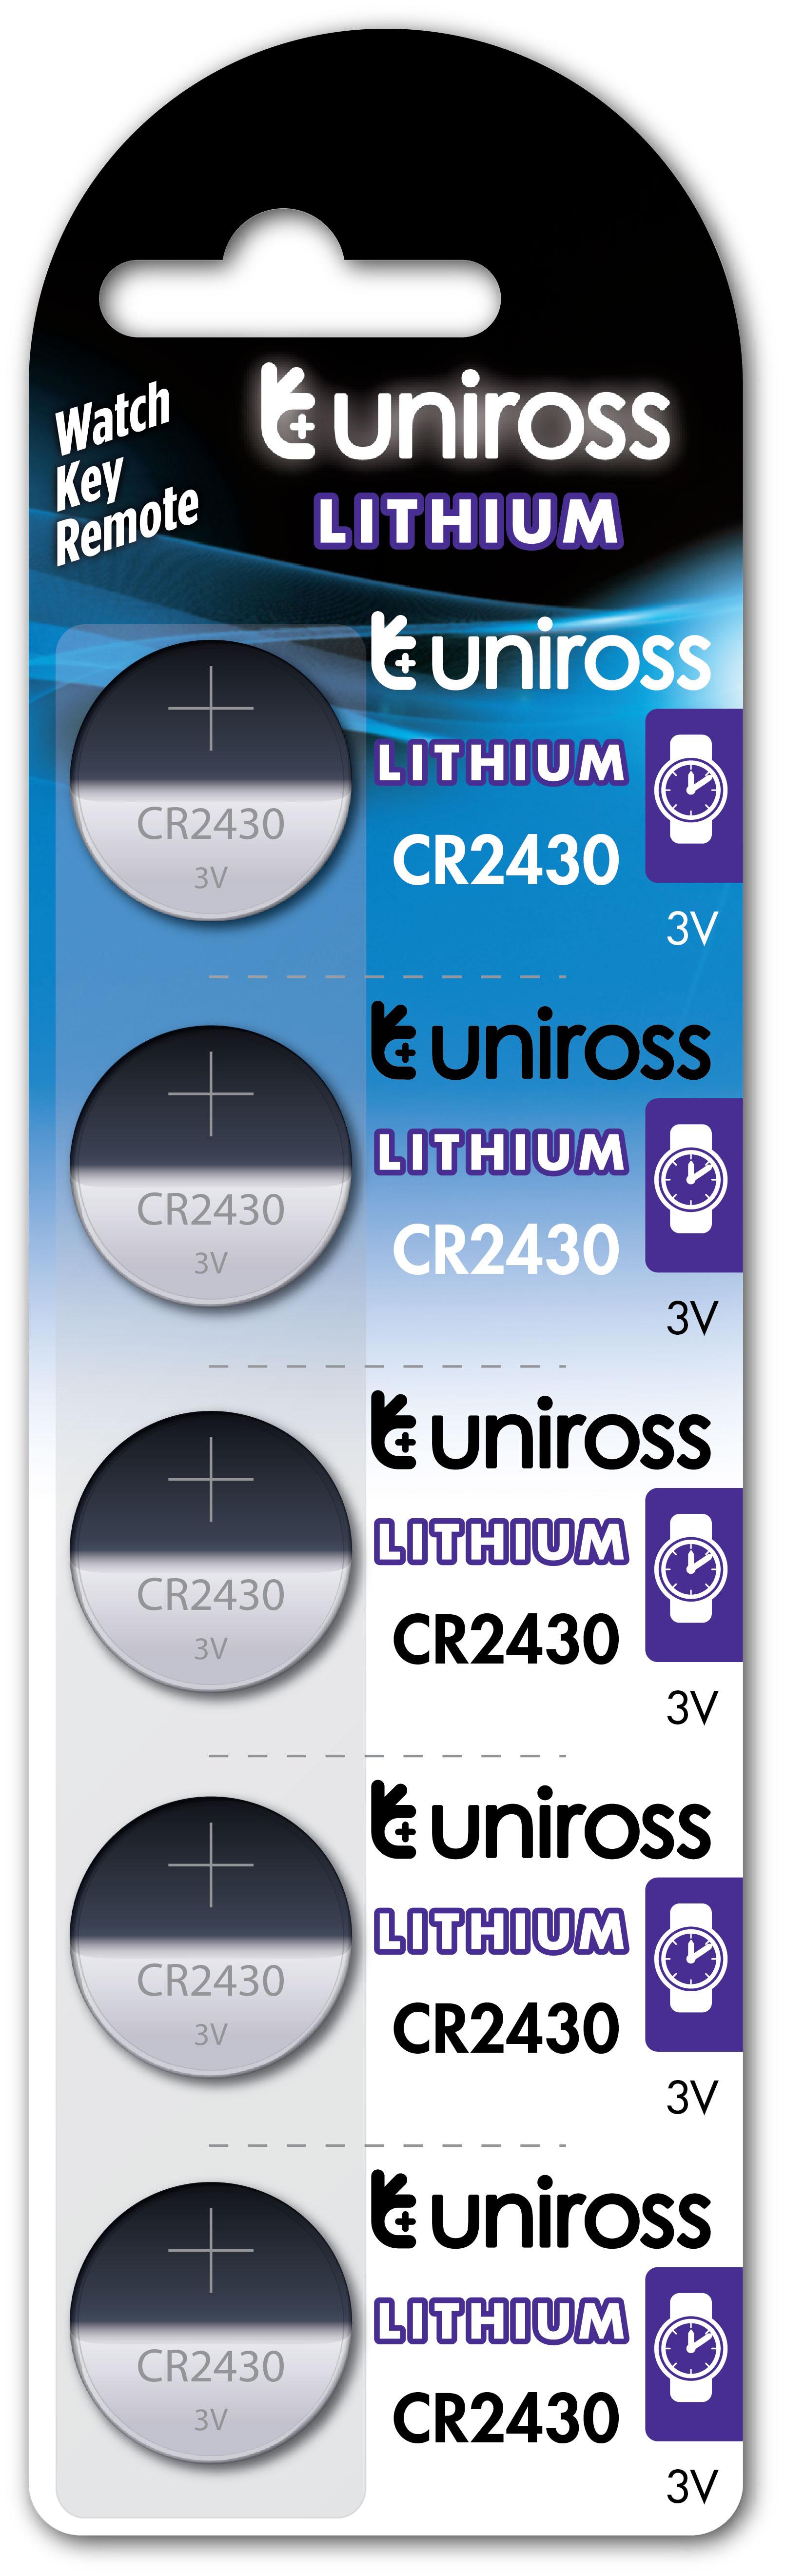 Button_Cell_[U5CR2430] UNIROSS BP5 CR2430 LITHIUM.jpg